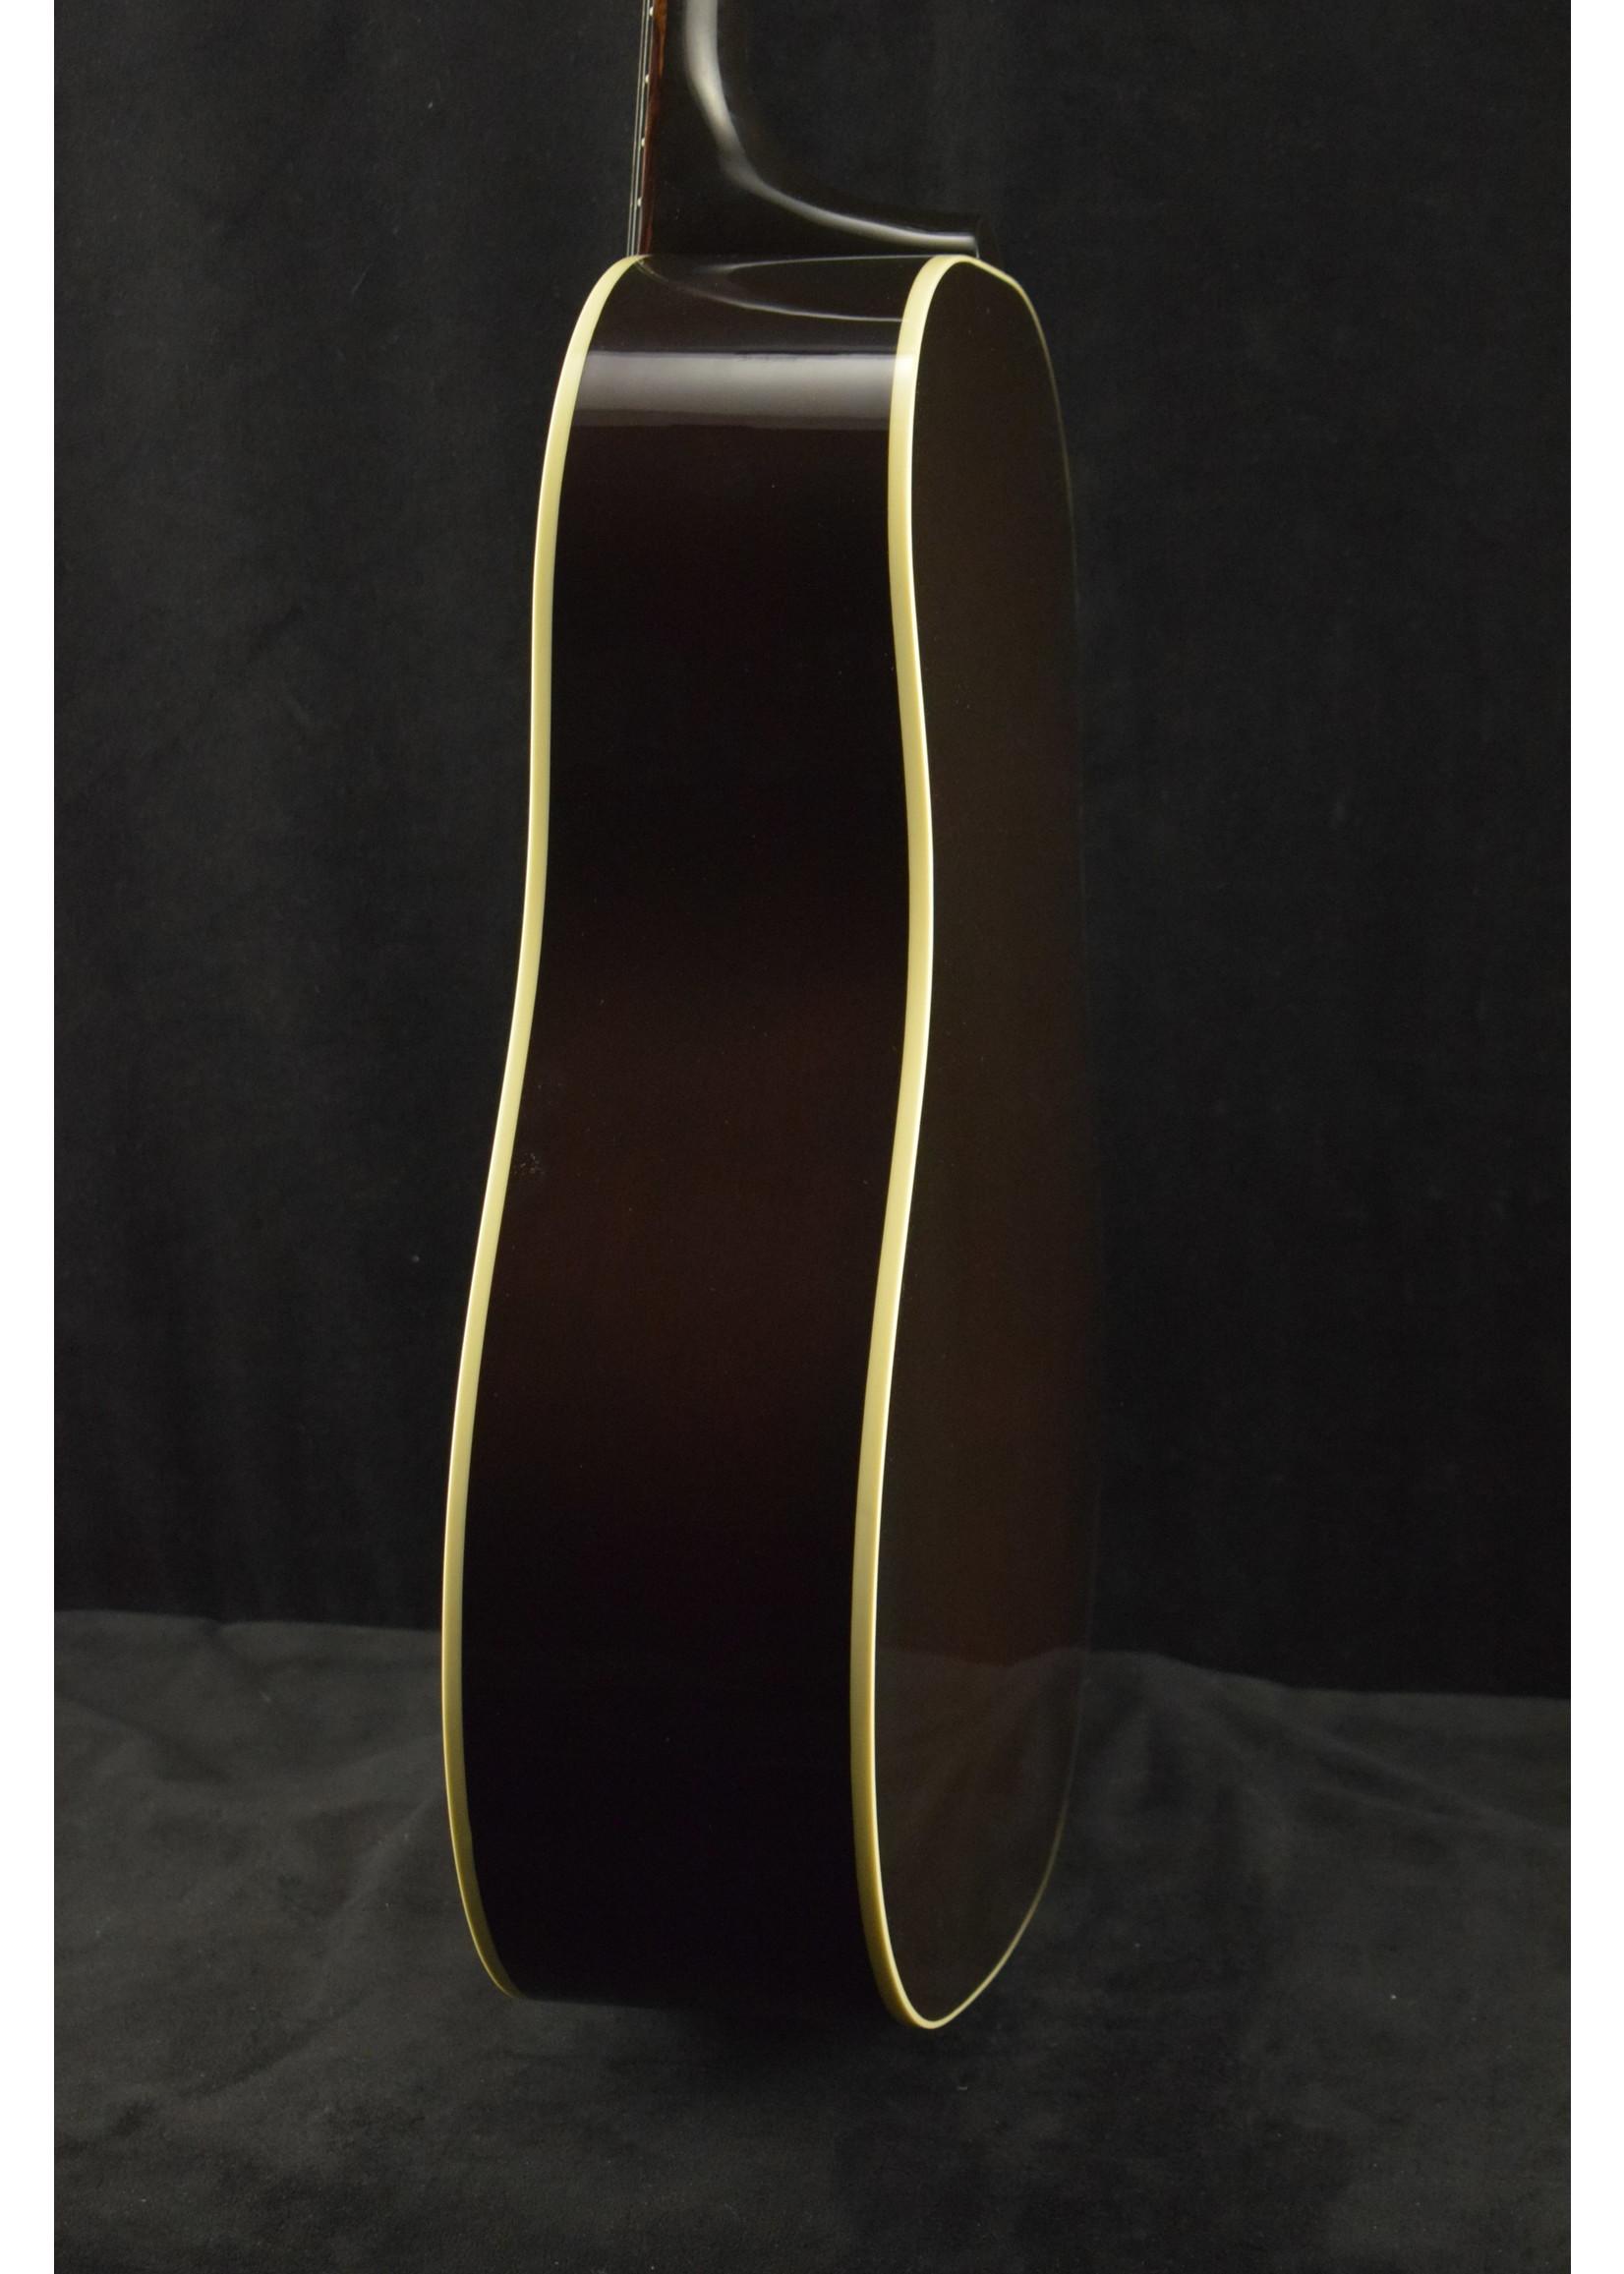 Gibson Gibson J-45 Standard Vintage Sunburst